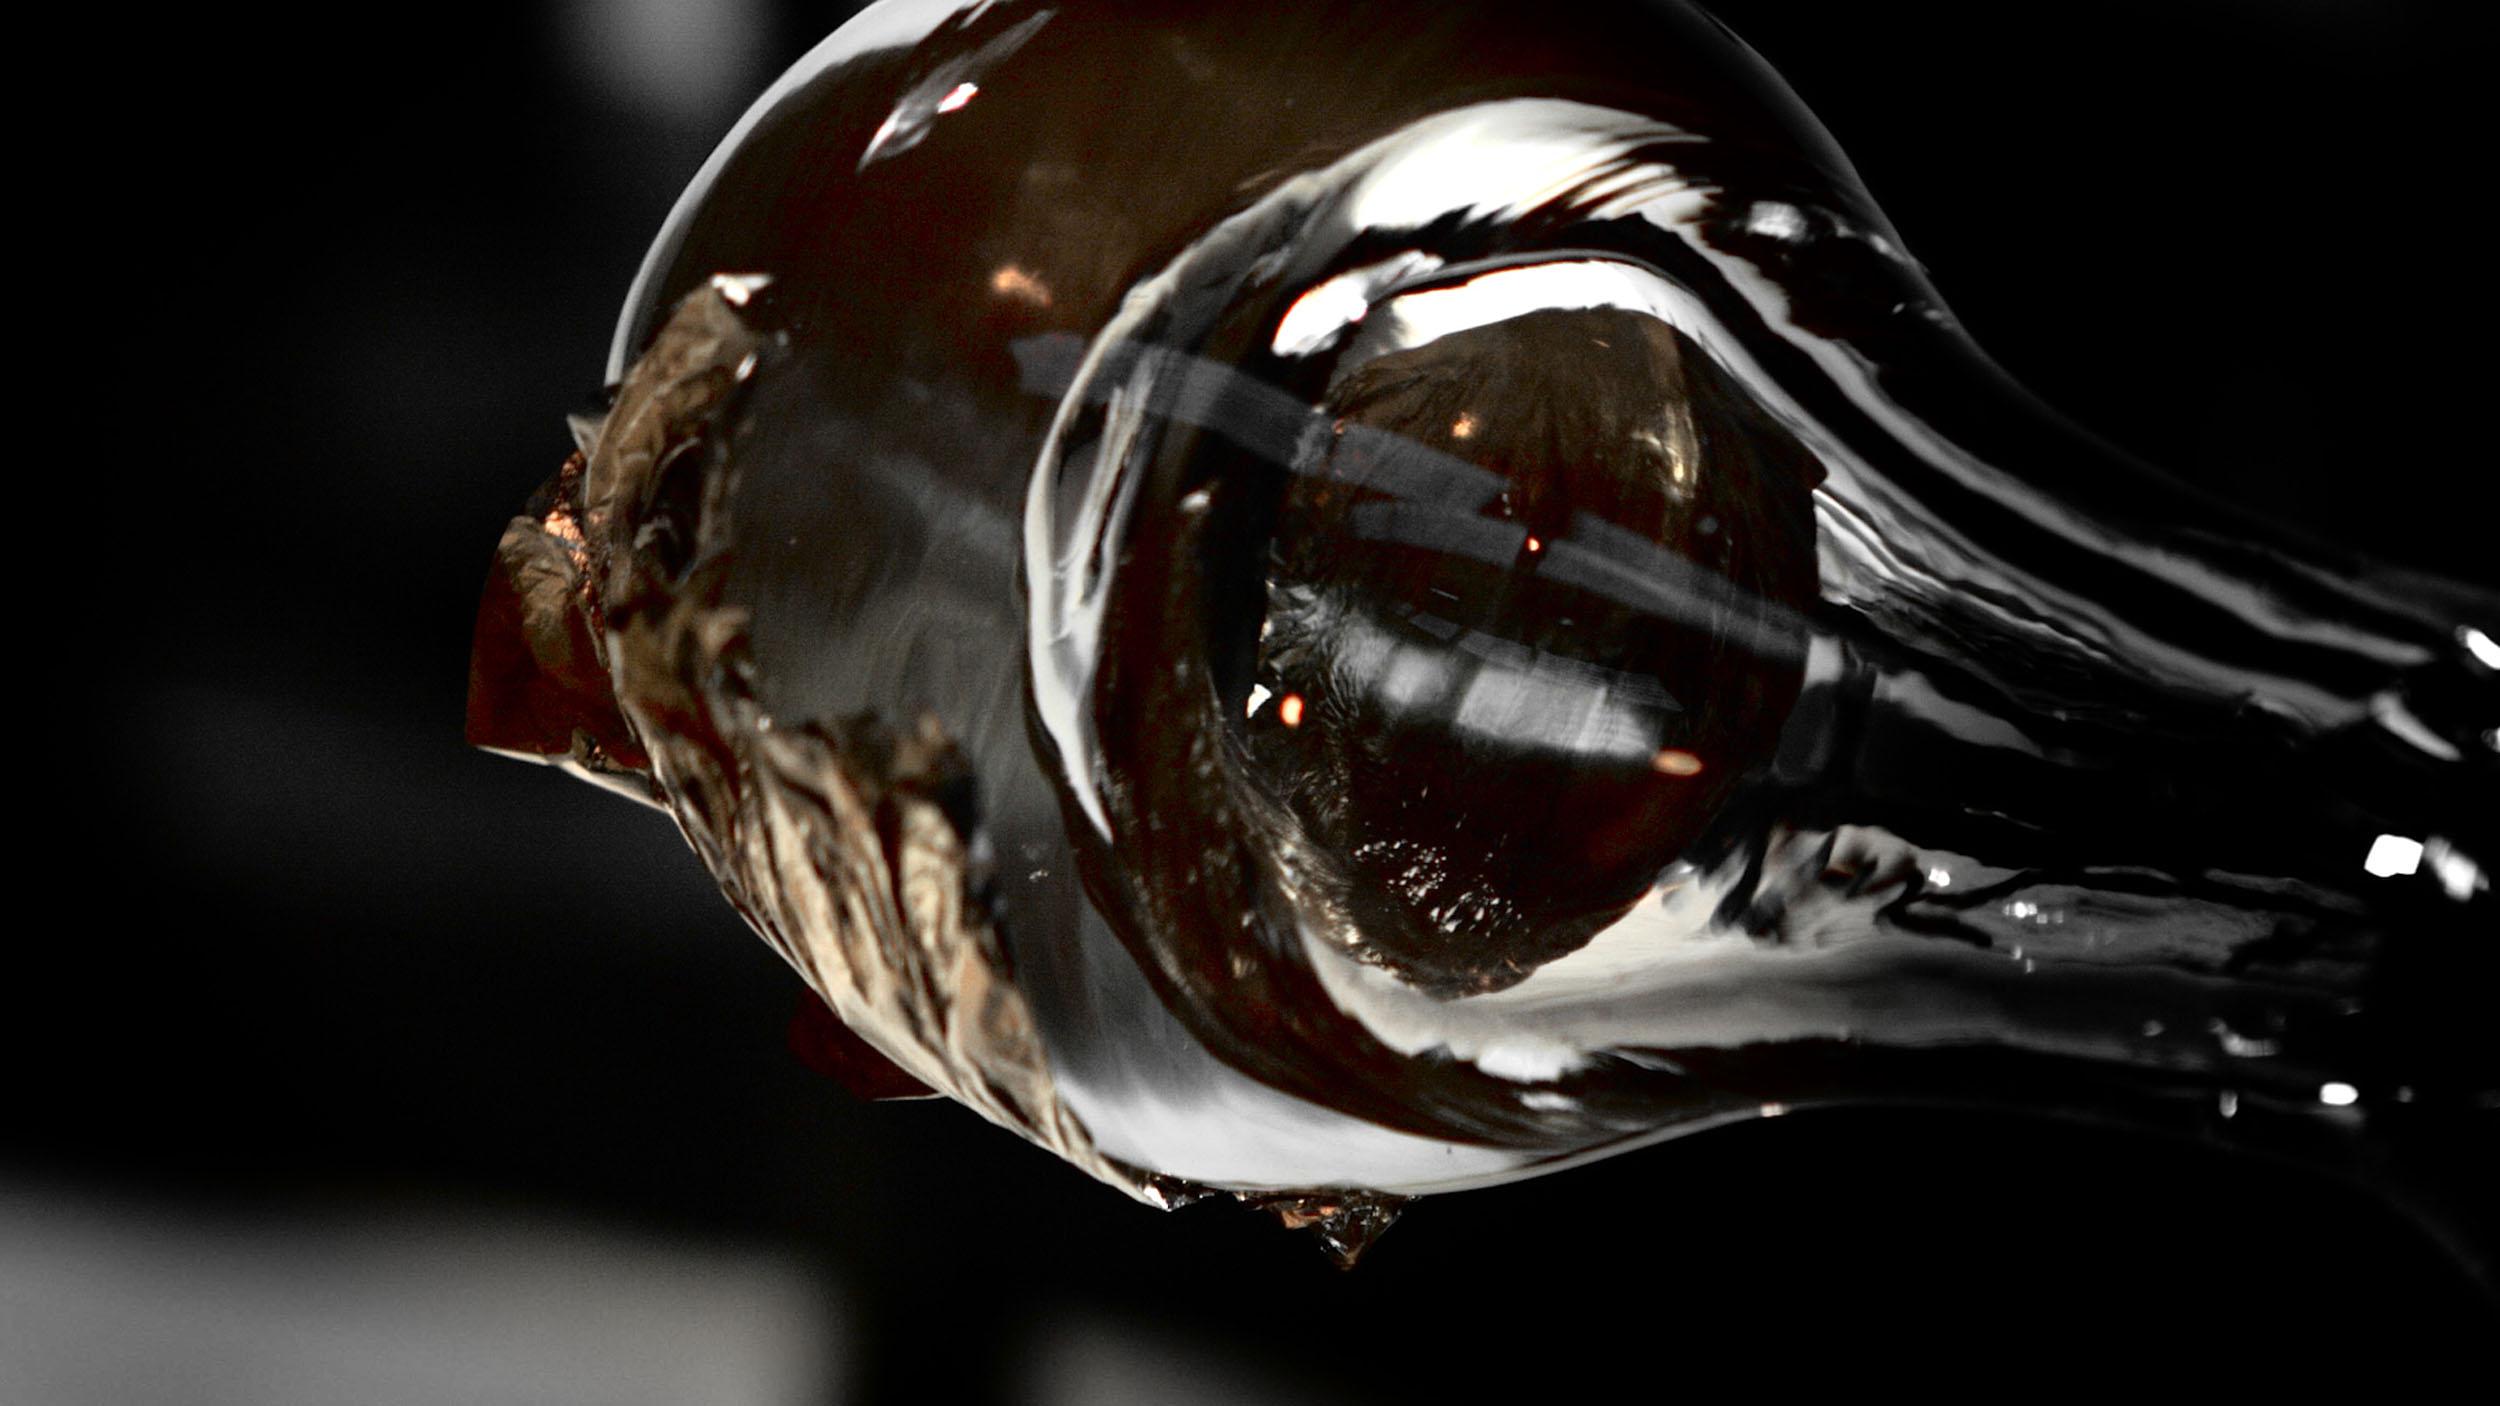 3-Glasstorm-Pedigree-Ethos-V007.00_00_19_03.Still002-WEB.jpg